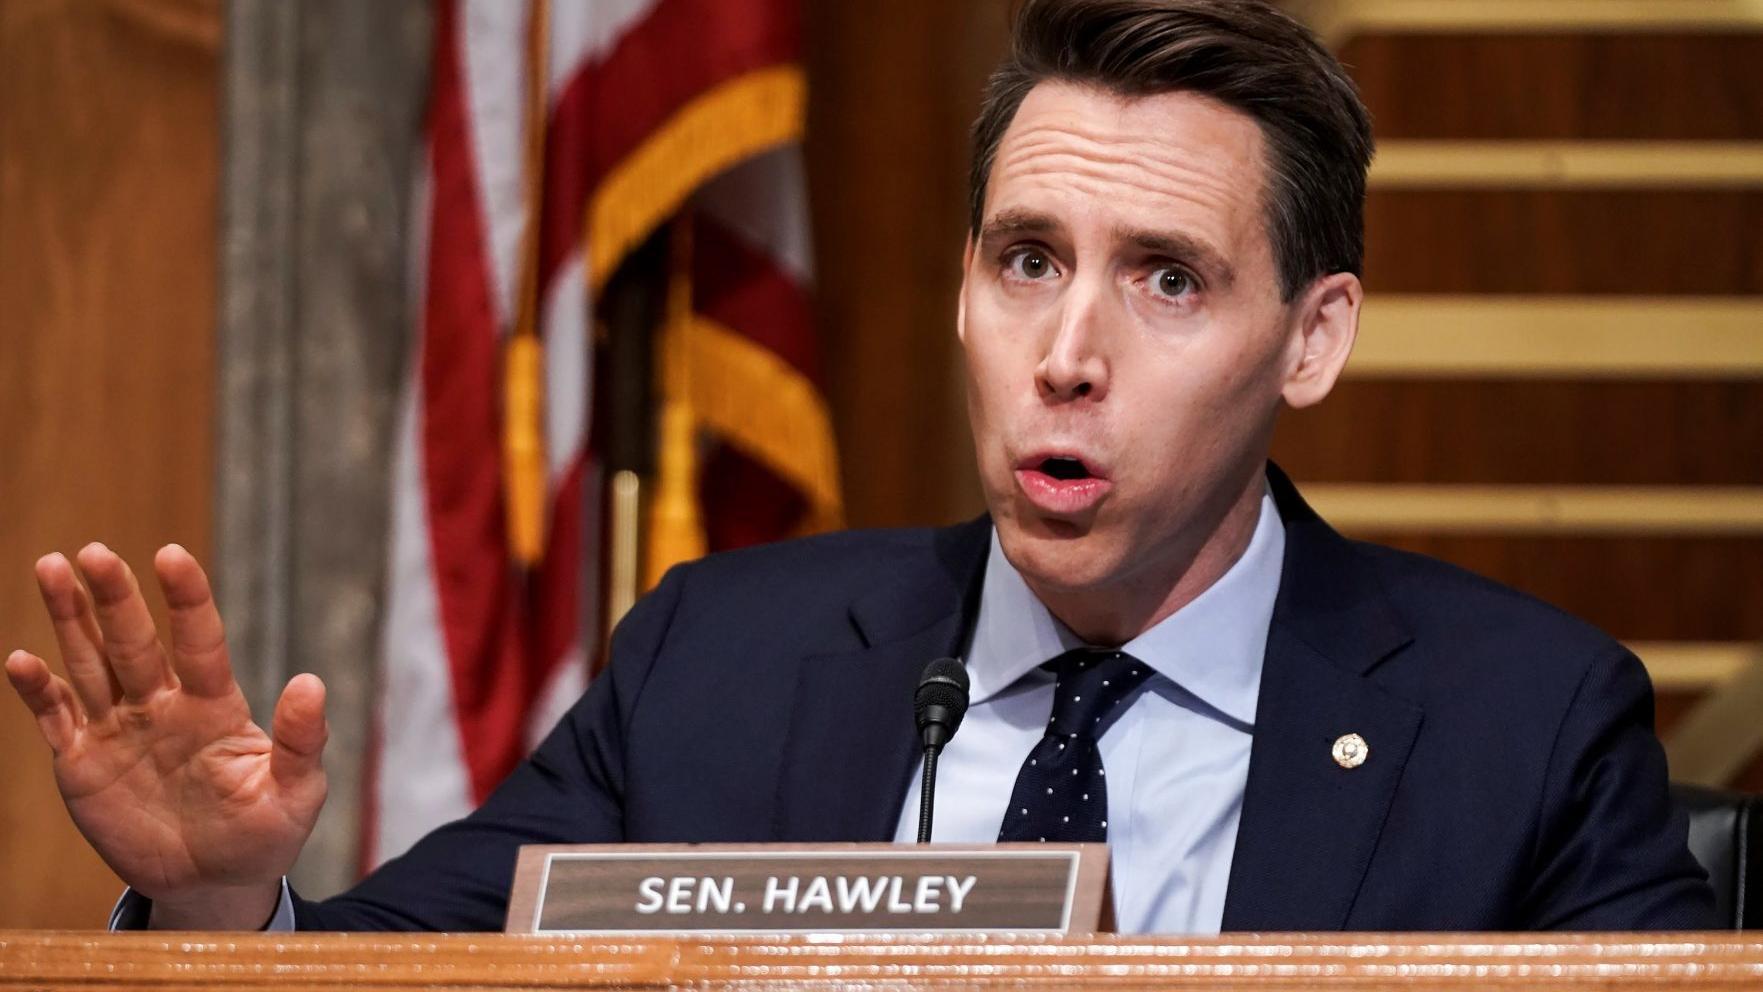 Walmart apologizes for tweet calling Sen. Josh Hawley sore loser